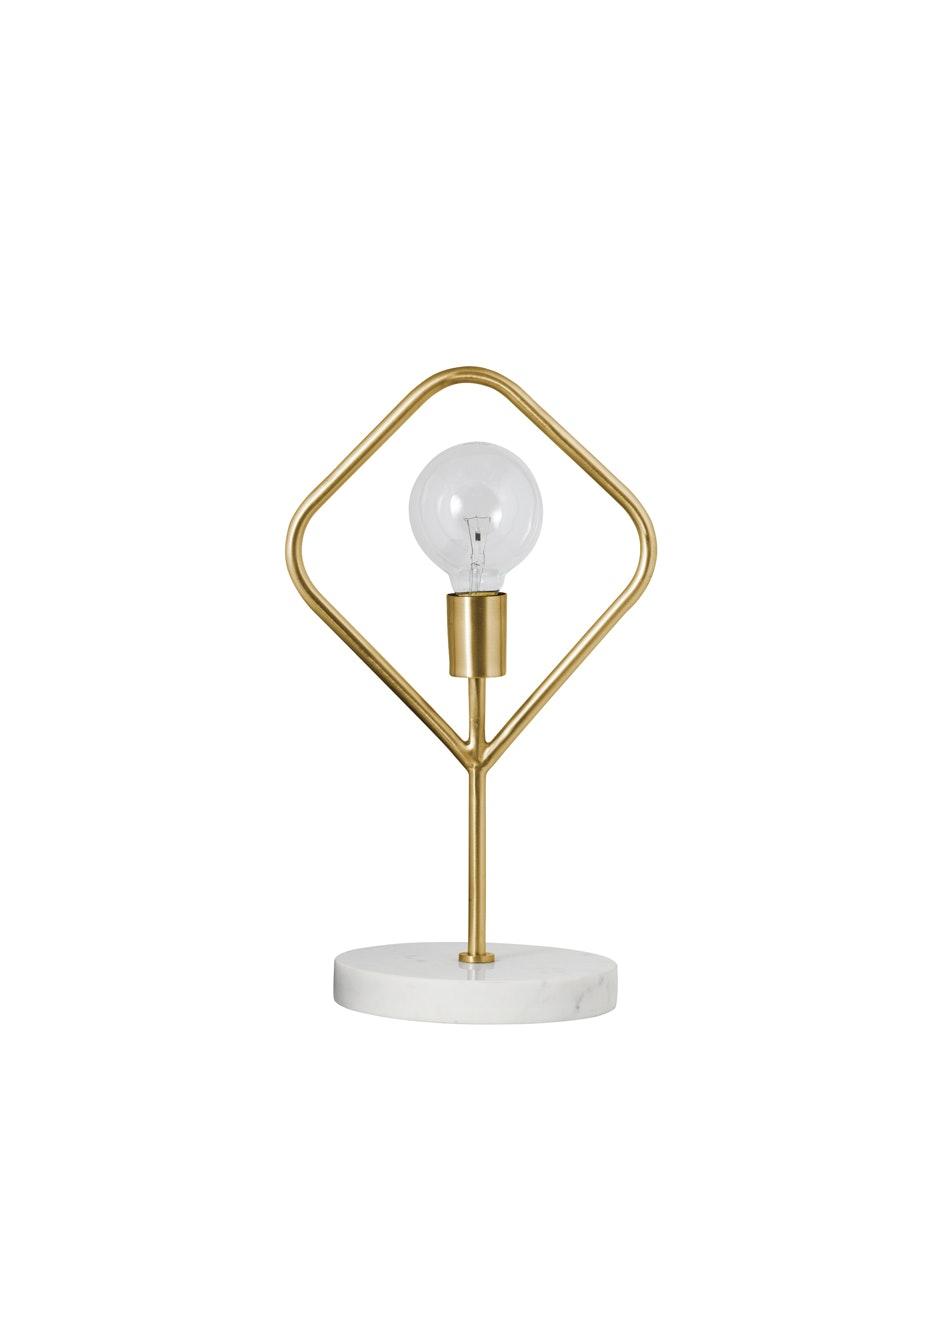 General Eclectic - Nova Table Lamp